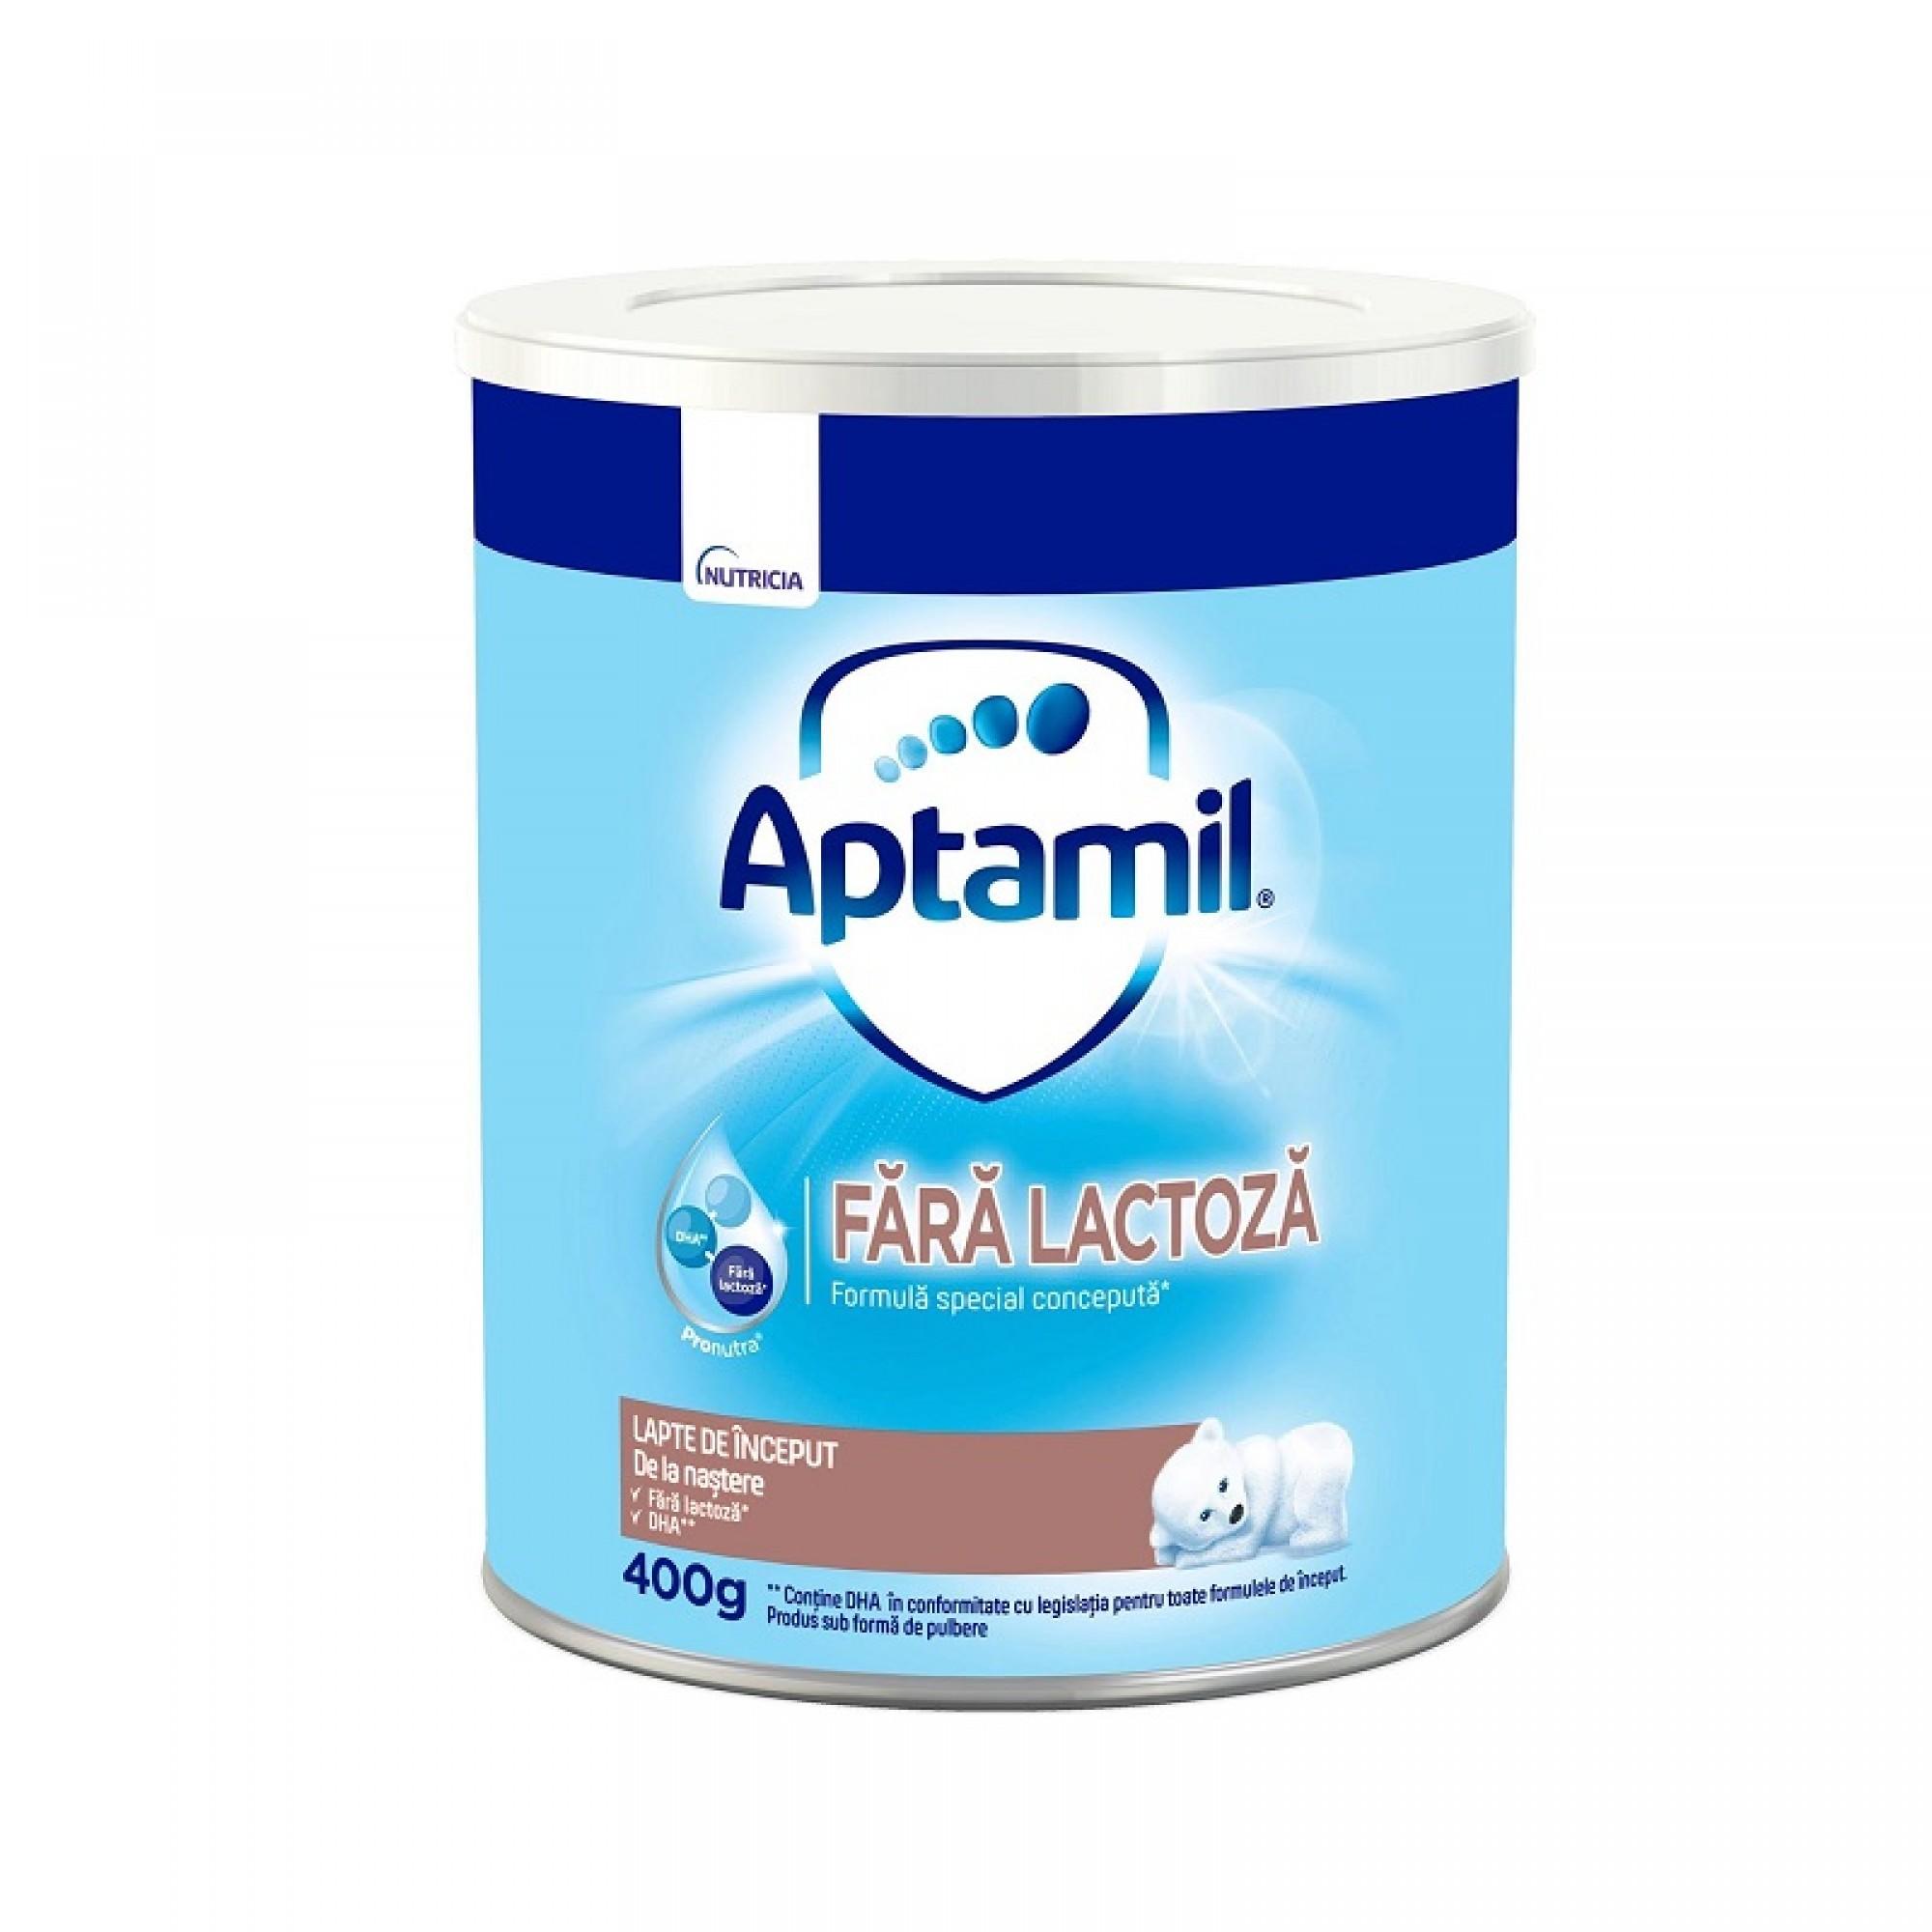 Aptamil fara lactoza Nutricia - 400g de la 0 luni